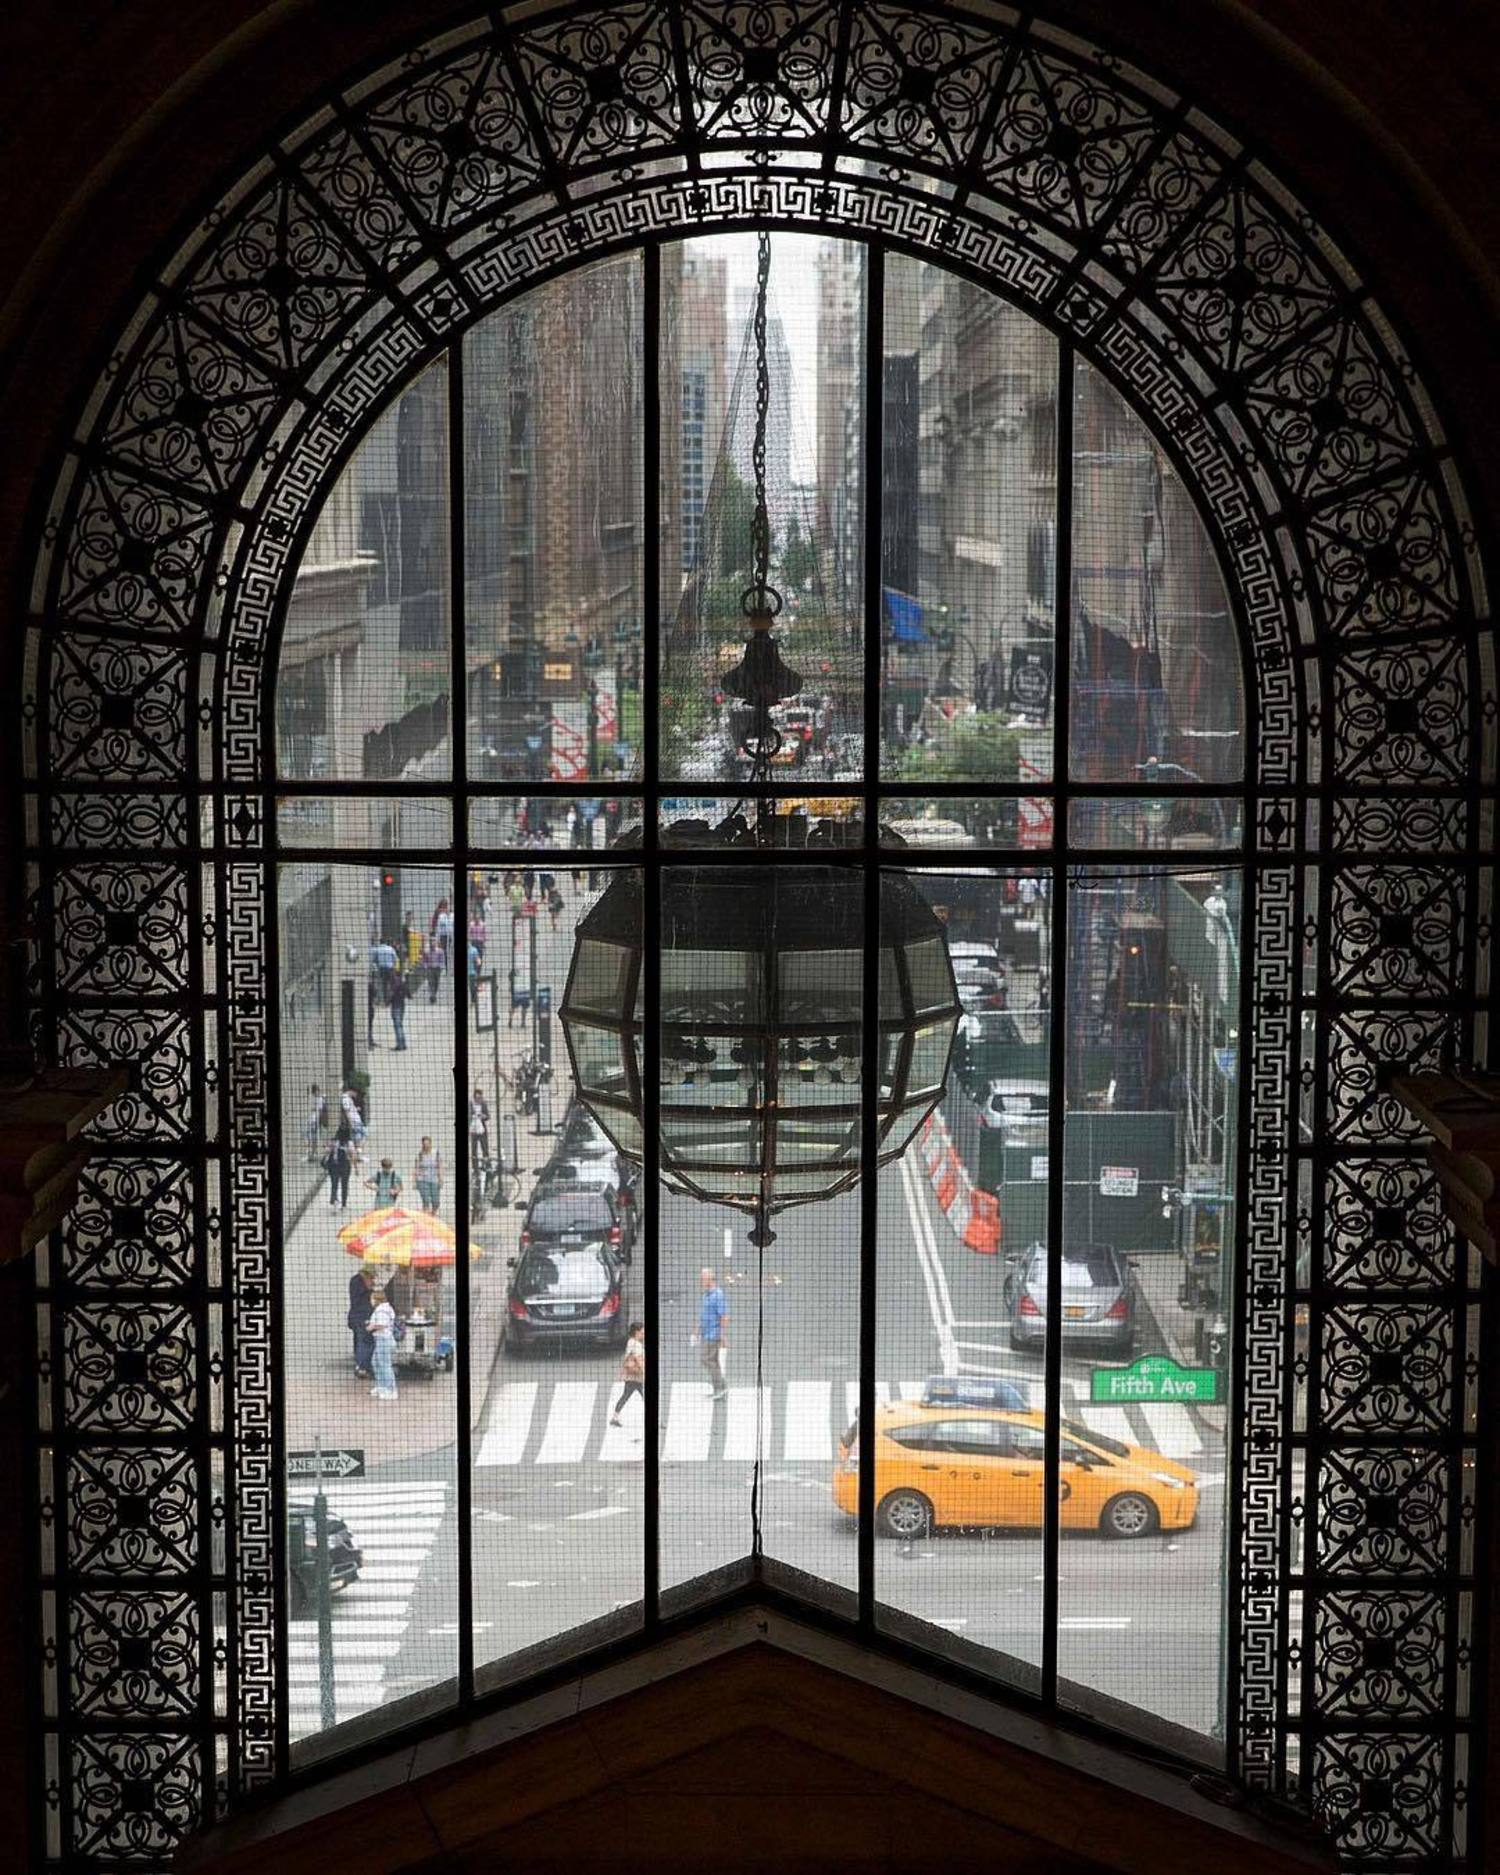 New York Public Library, Stephen A. Schwarzman Building, Midtown, Manhattan